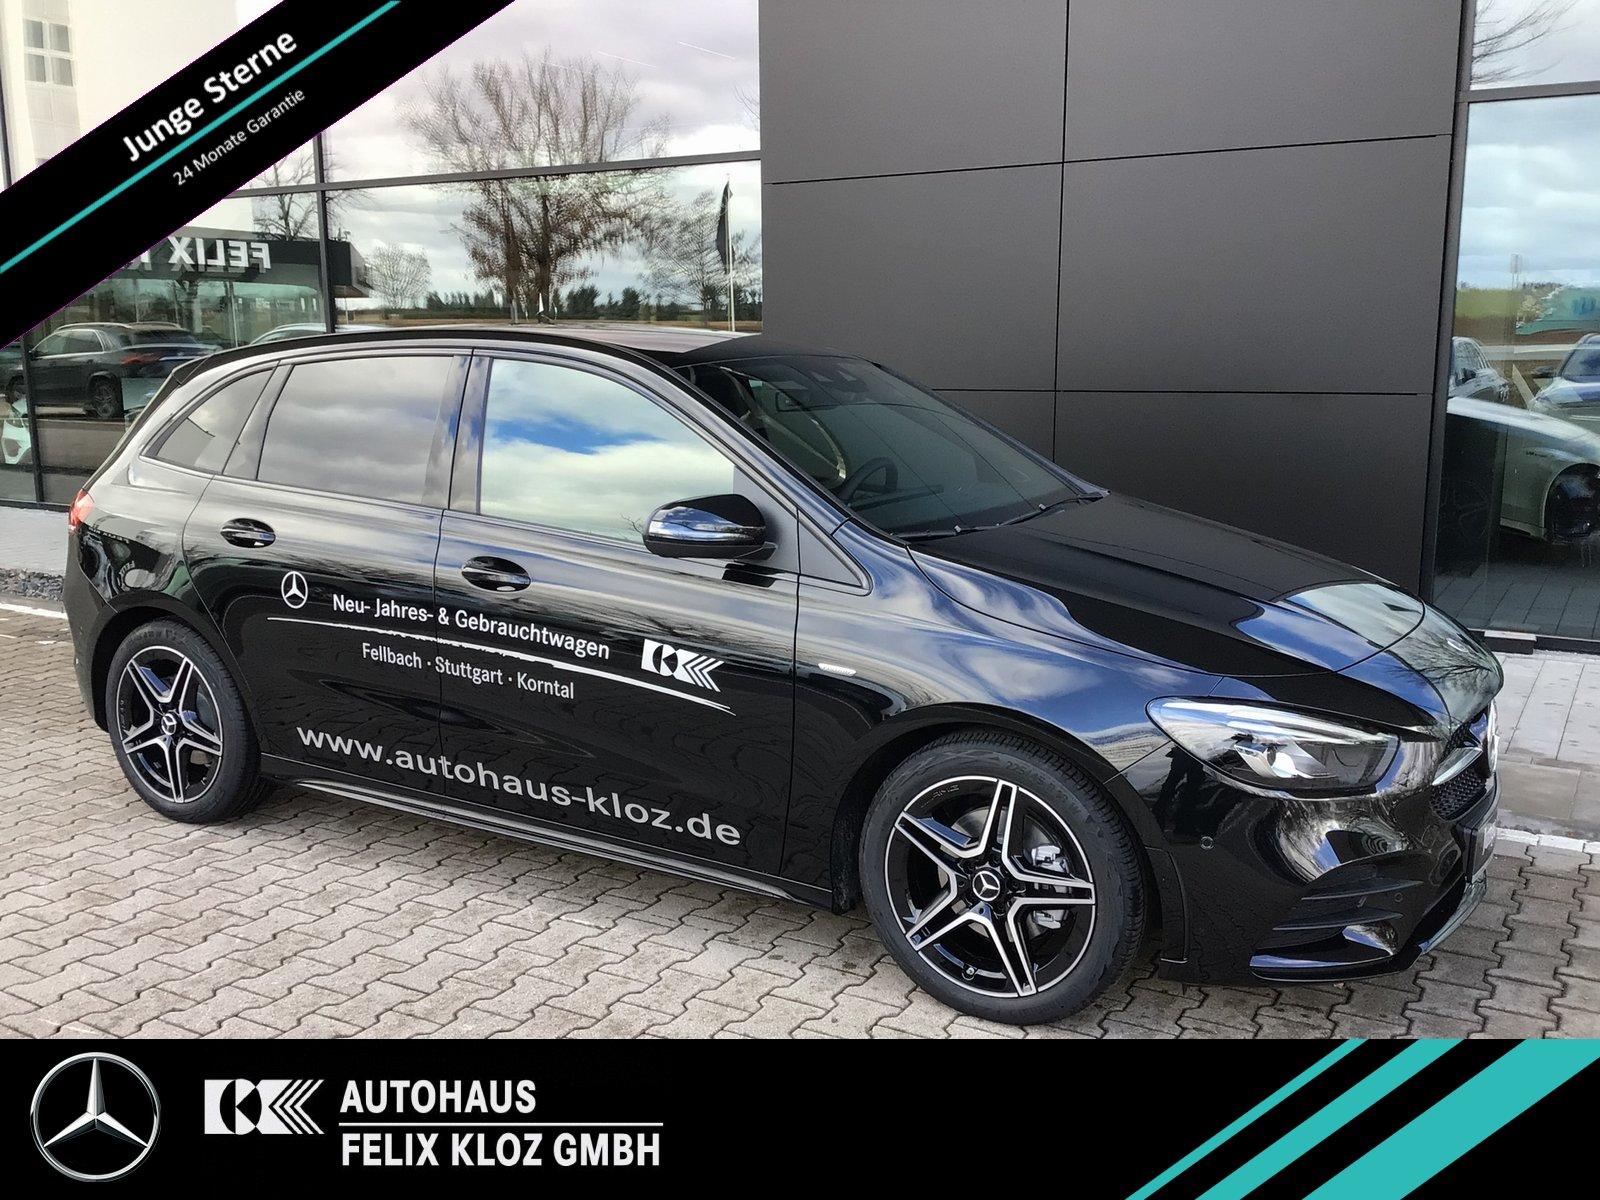 Mercedes-Benz B 200 Edition 2020 AMG MBUX High End AHK Kamera, Jahr 2020, Benzin